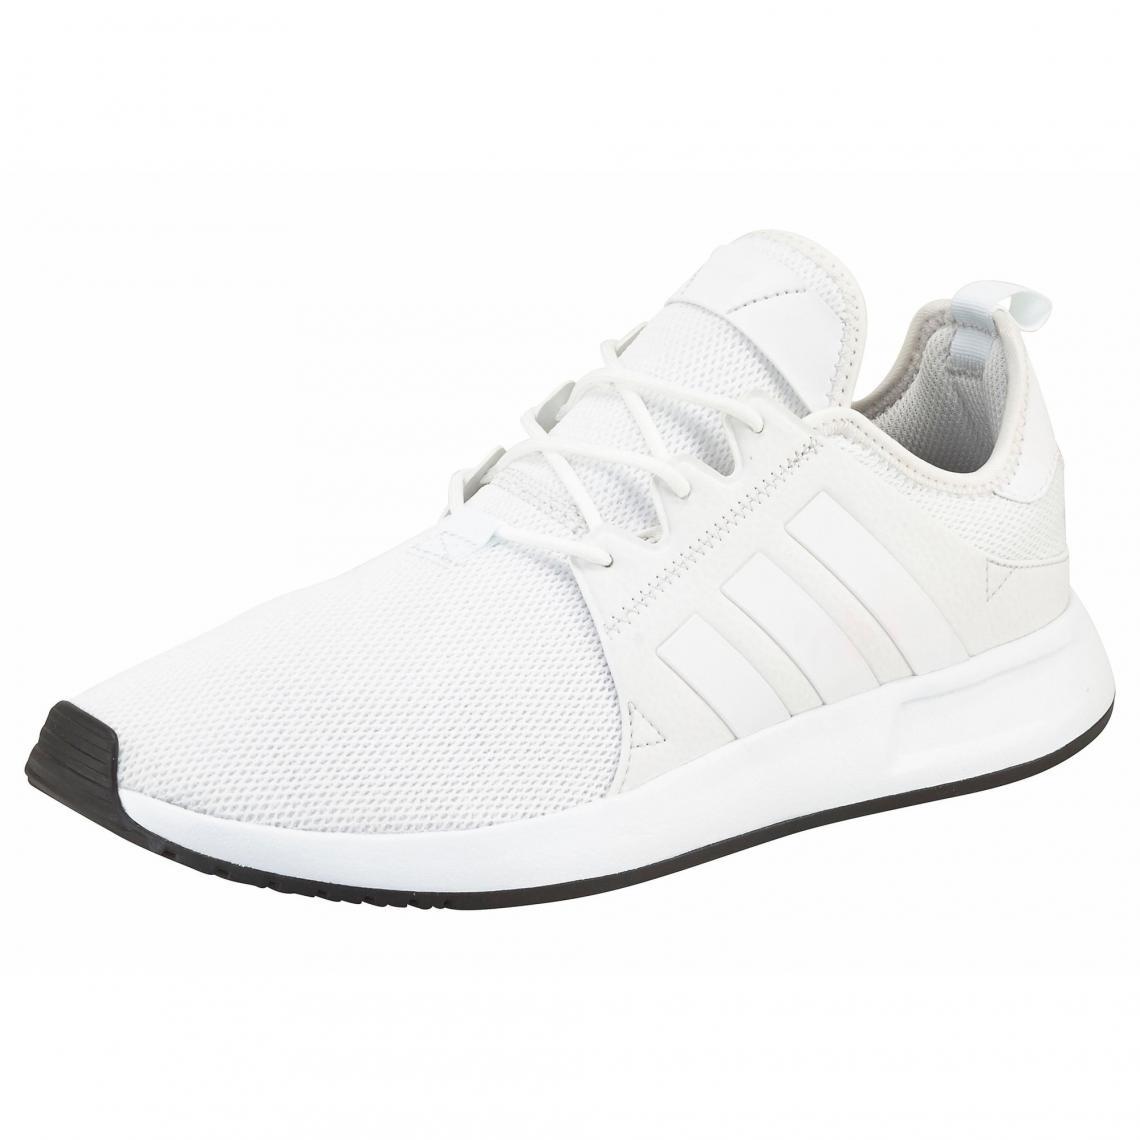 39b5ab84937 didas Originals X PLR baskets homme - Blanc - Noir Adidas Originals Homme